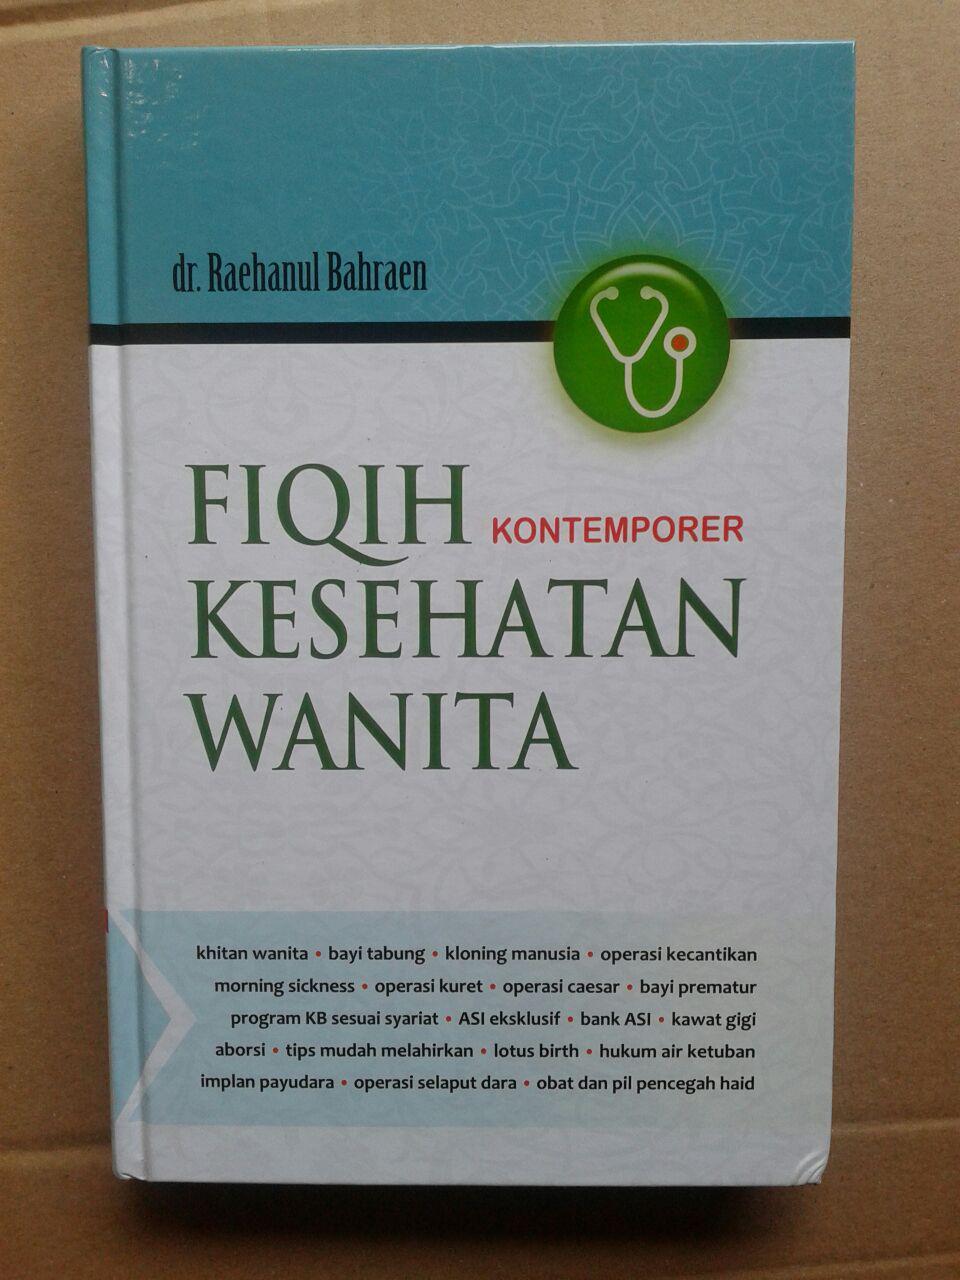 Buku Fiqih Kontemporer Kesehatan Wanita cover